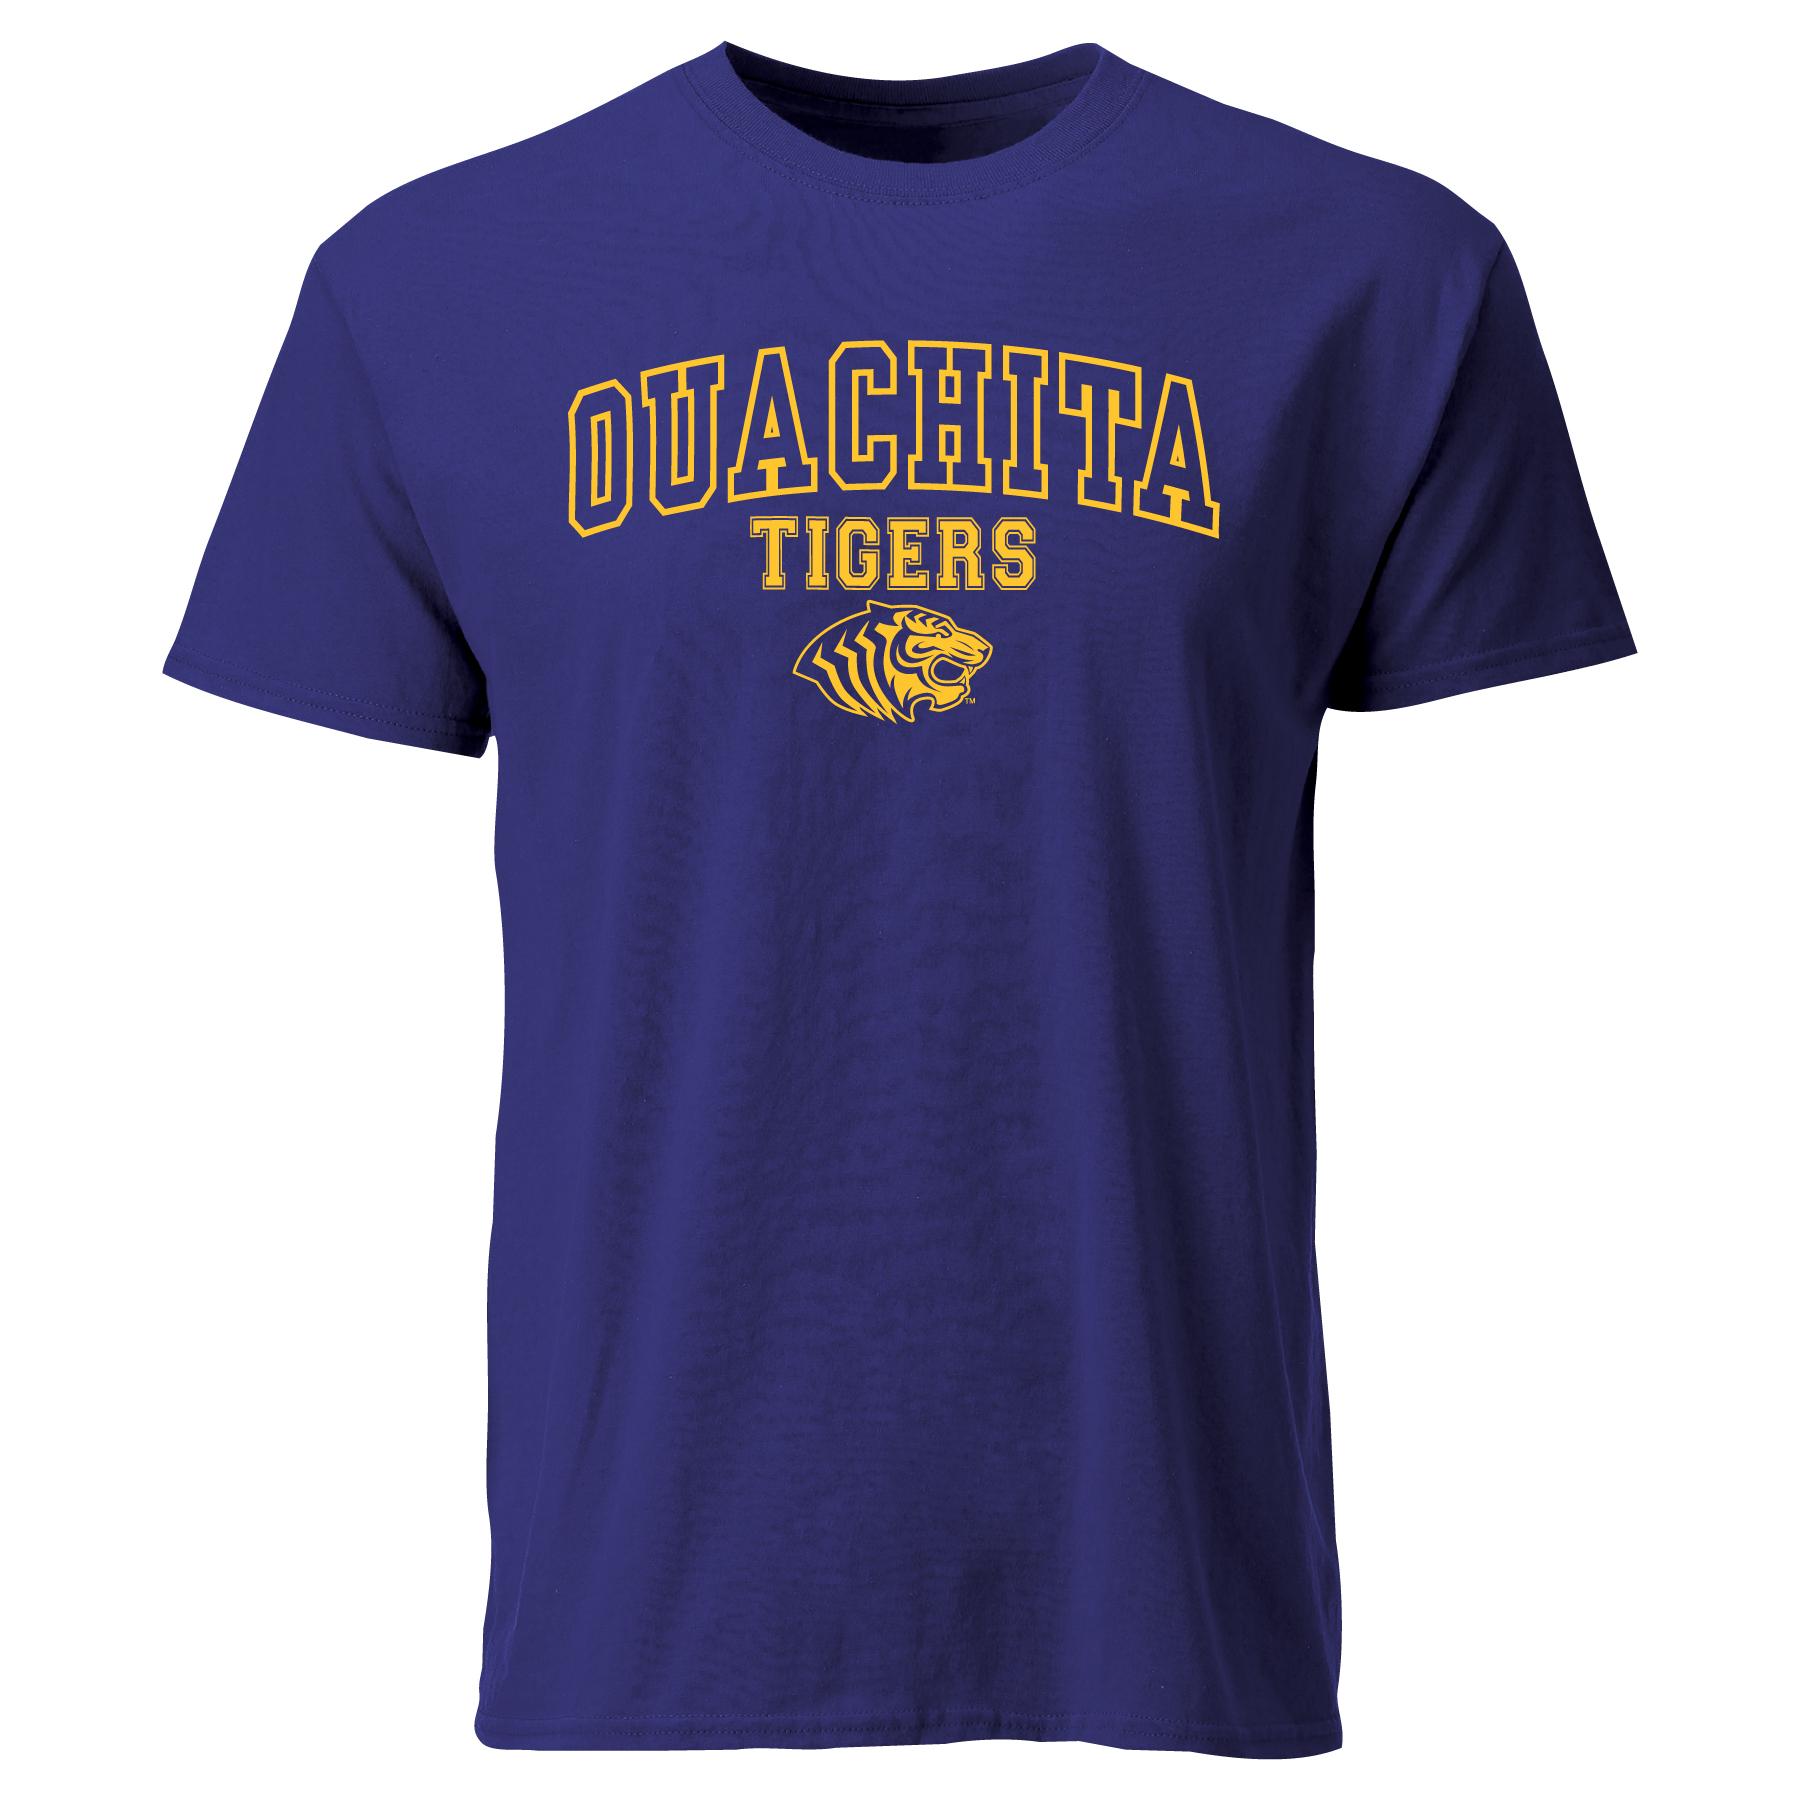 OUACHITA TIGERS SS TEE